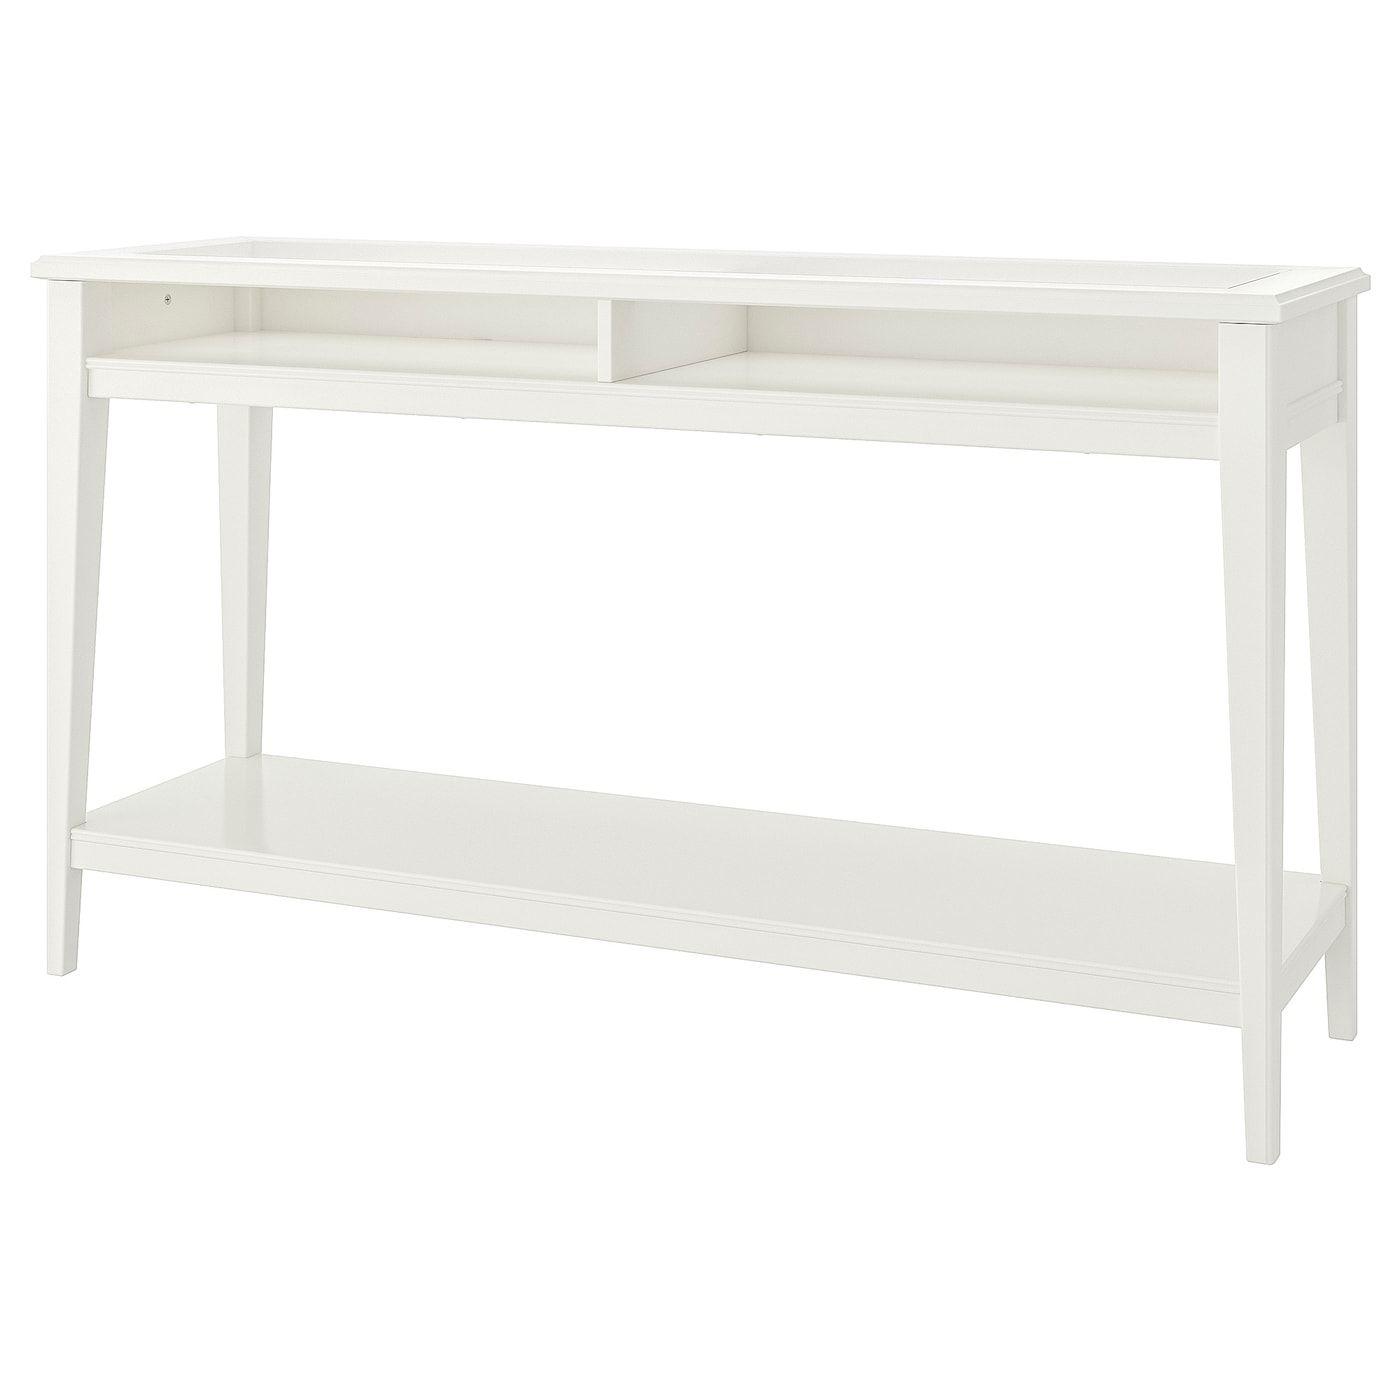 Liatorp Ablagetisch Weiss Glas 133x37 Cm Ikea Osterreich Liatorp Console Table White Console Table [ 1400 x 1400 Pixel ]